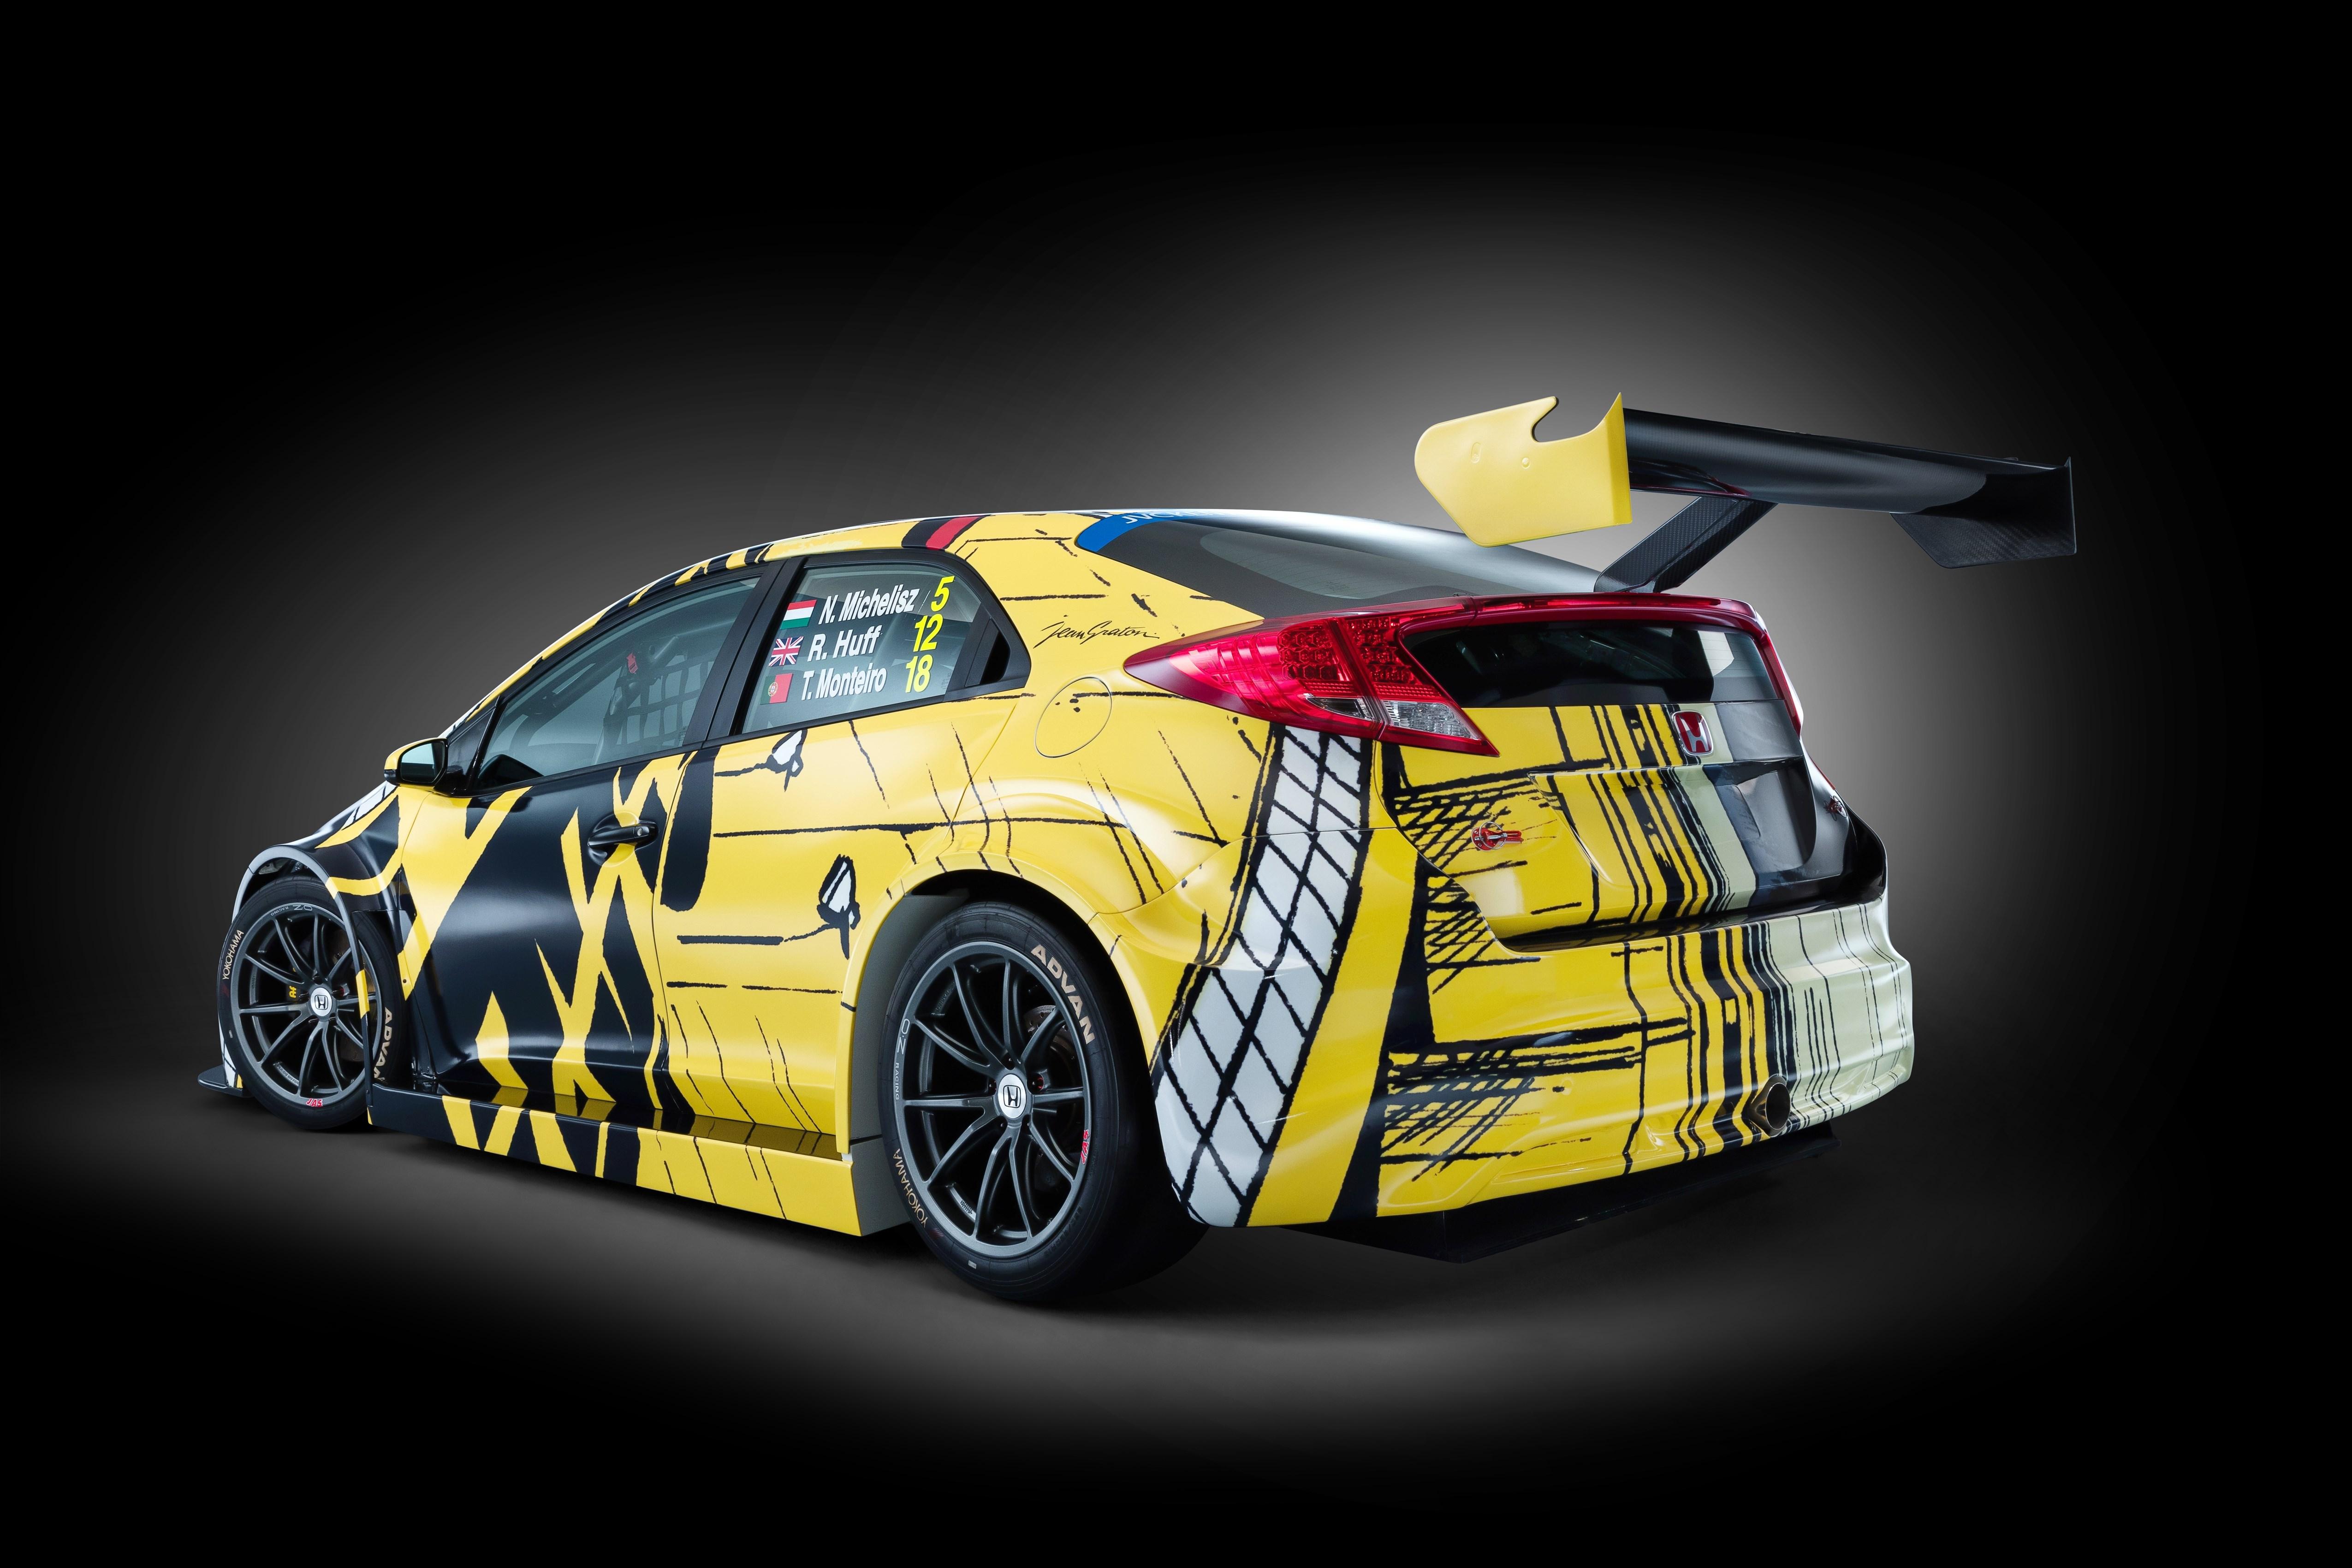 Michel Vaillant-Inspired Honda Art Car to Make Race Debut ...